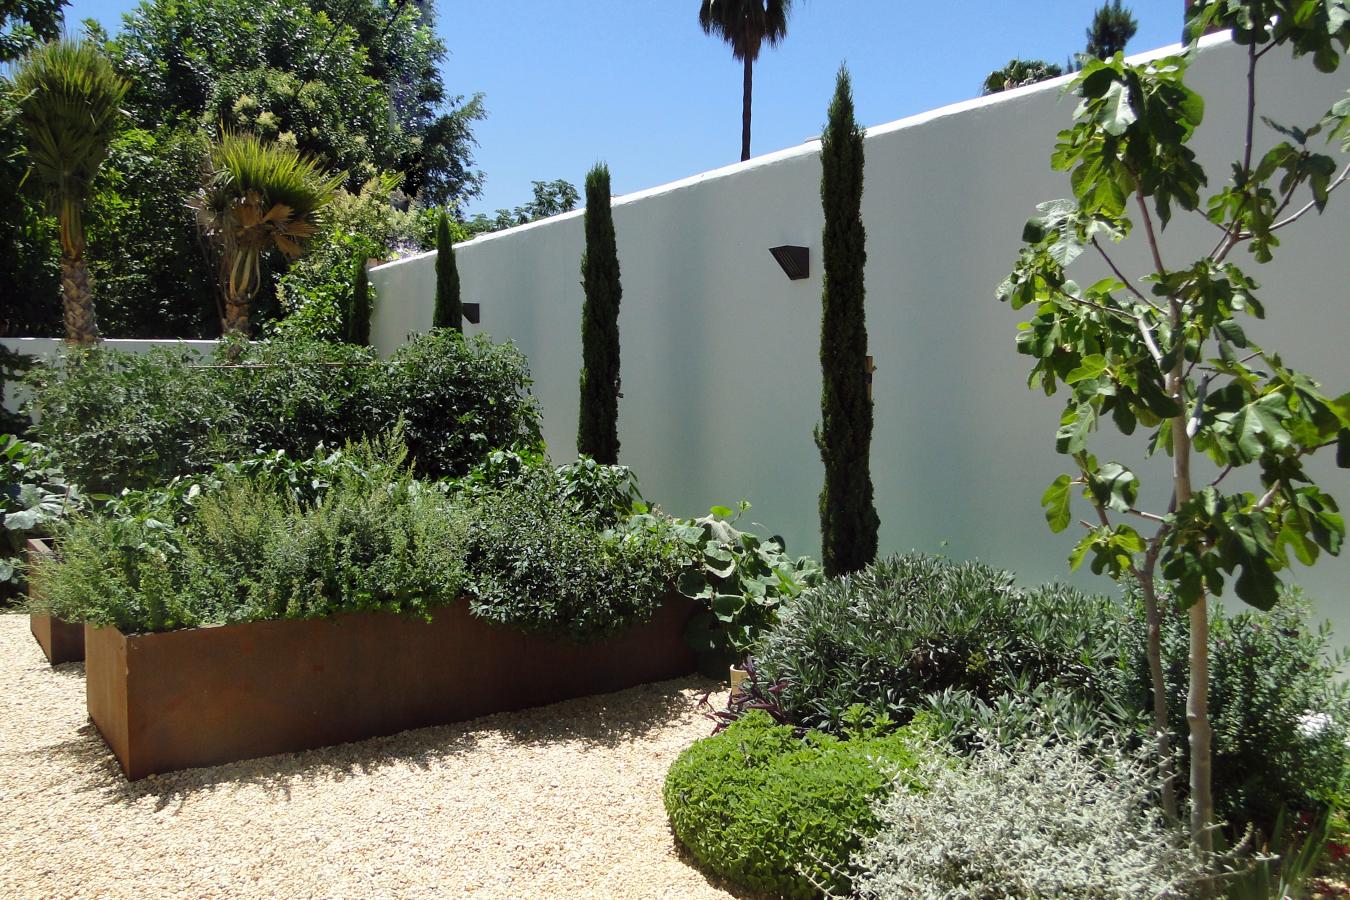 Huerto urbano en jardín de Sevilla